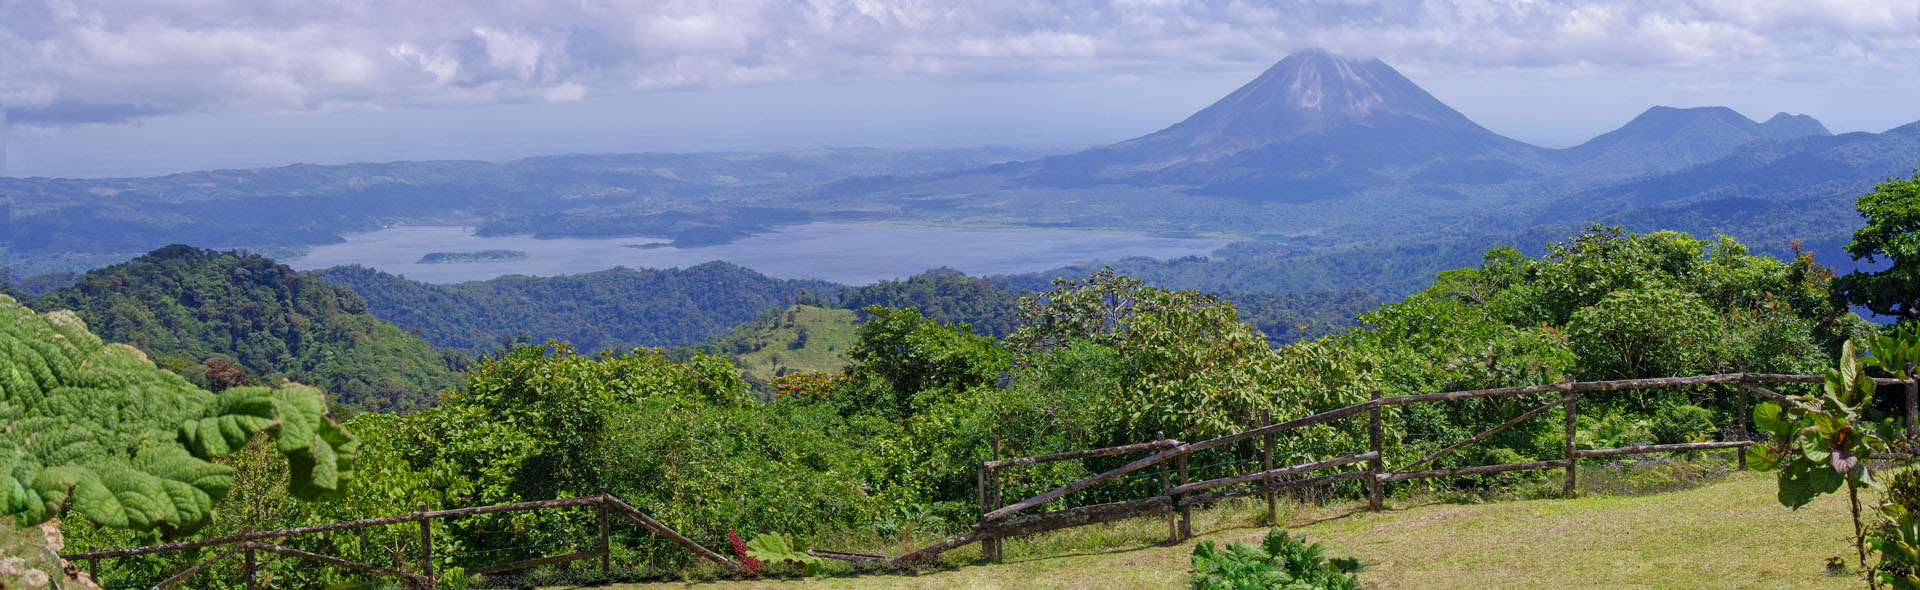 Himmelsstürme in Monteverde